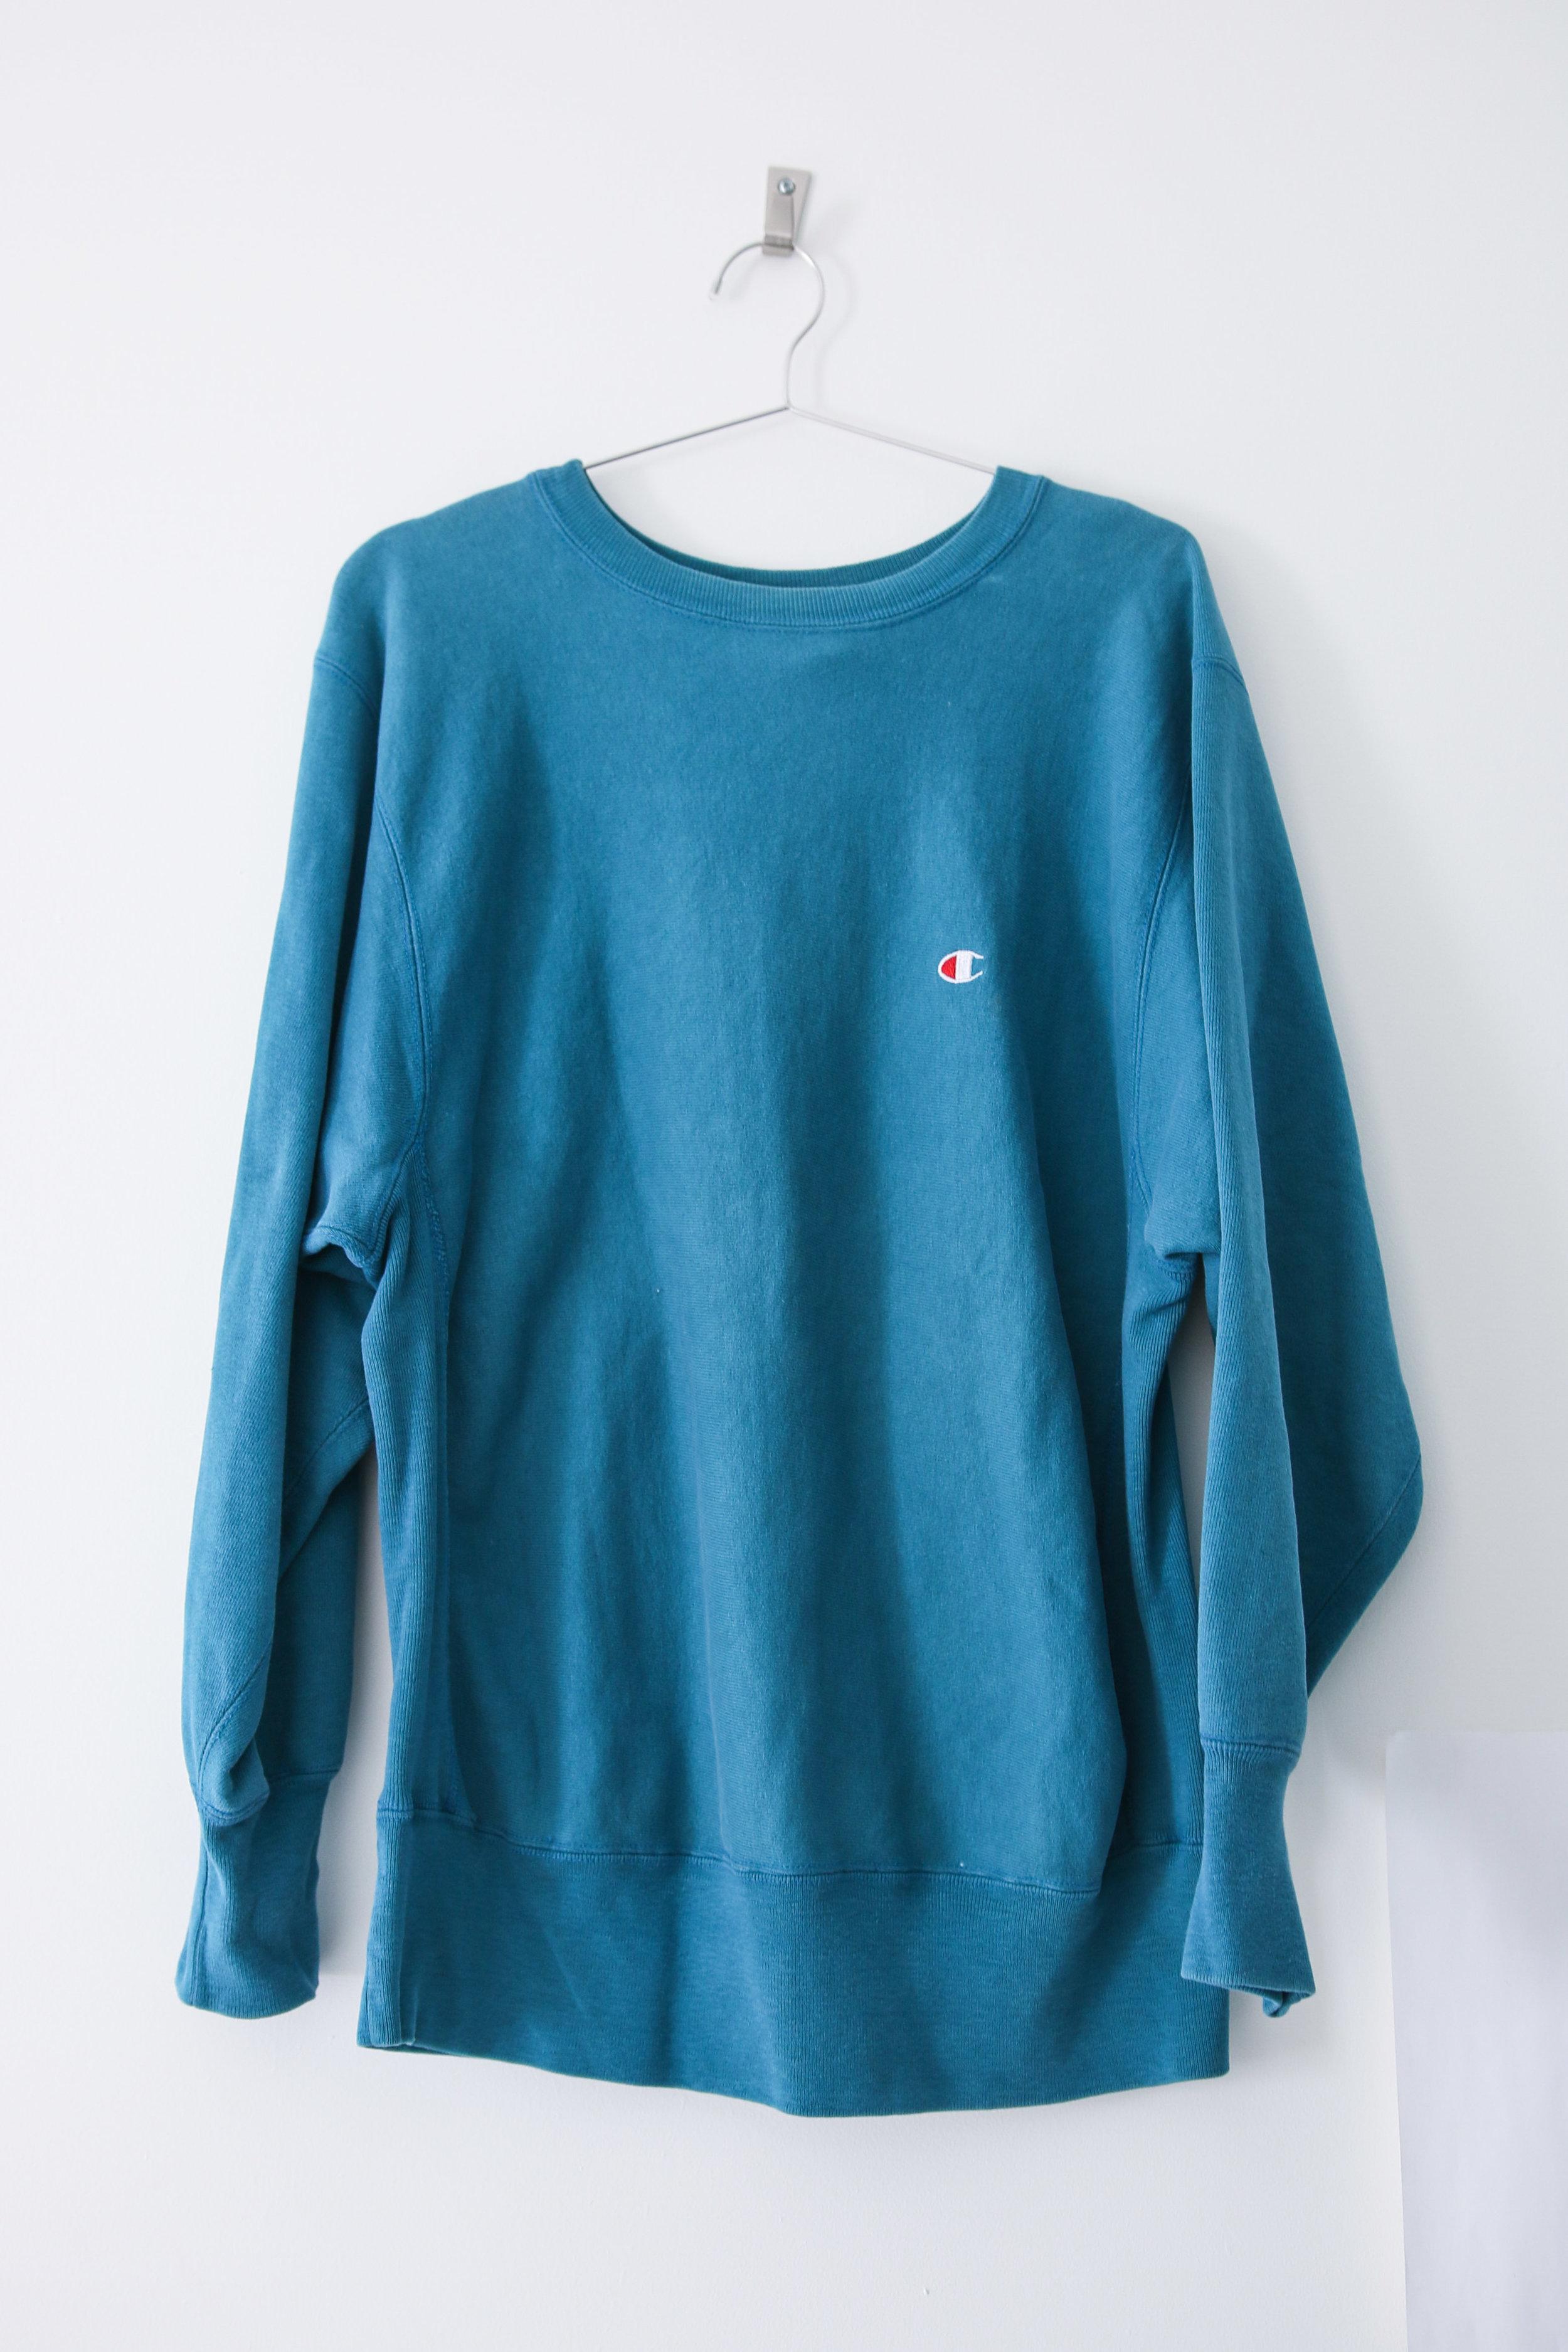 c30850a8867a M - Vintage Champion Sweatshirt Reverse Weave - Teal. TCP - online-0890.jpg